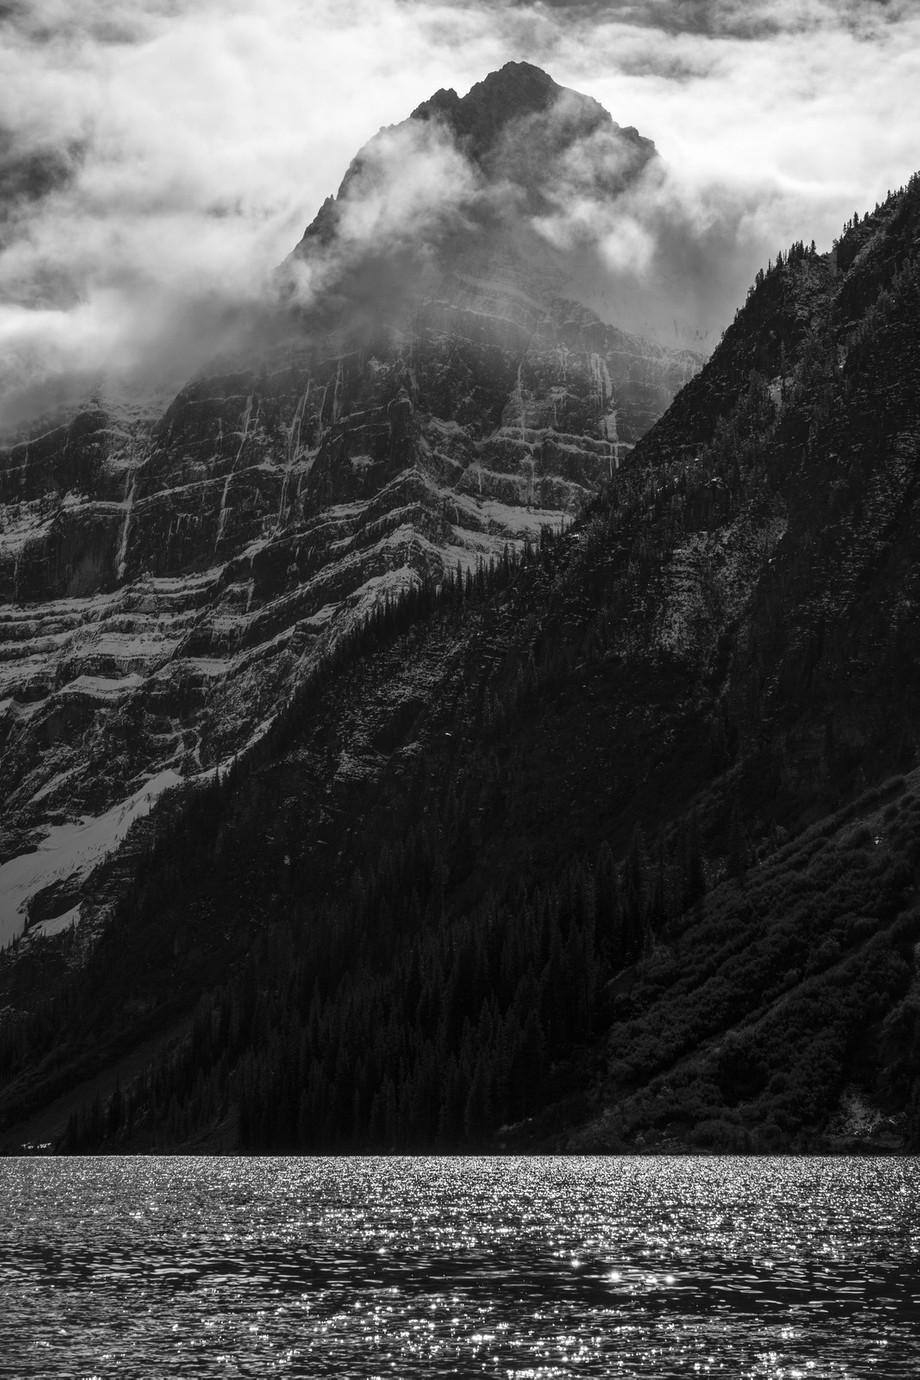 Chepren Lake by EvanHaas - Social Exposure Photo Contest Vol 16